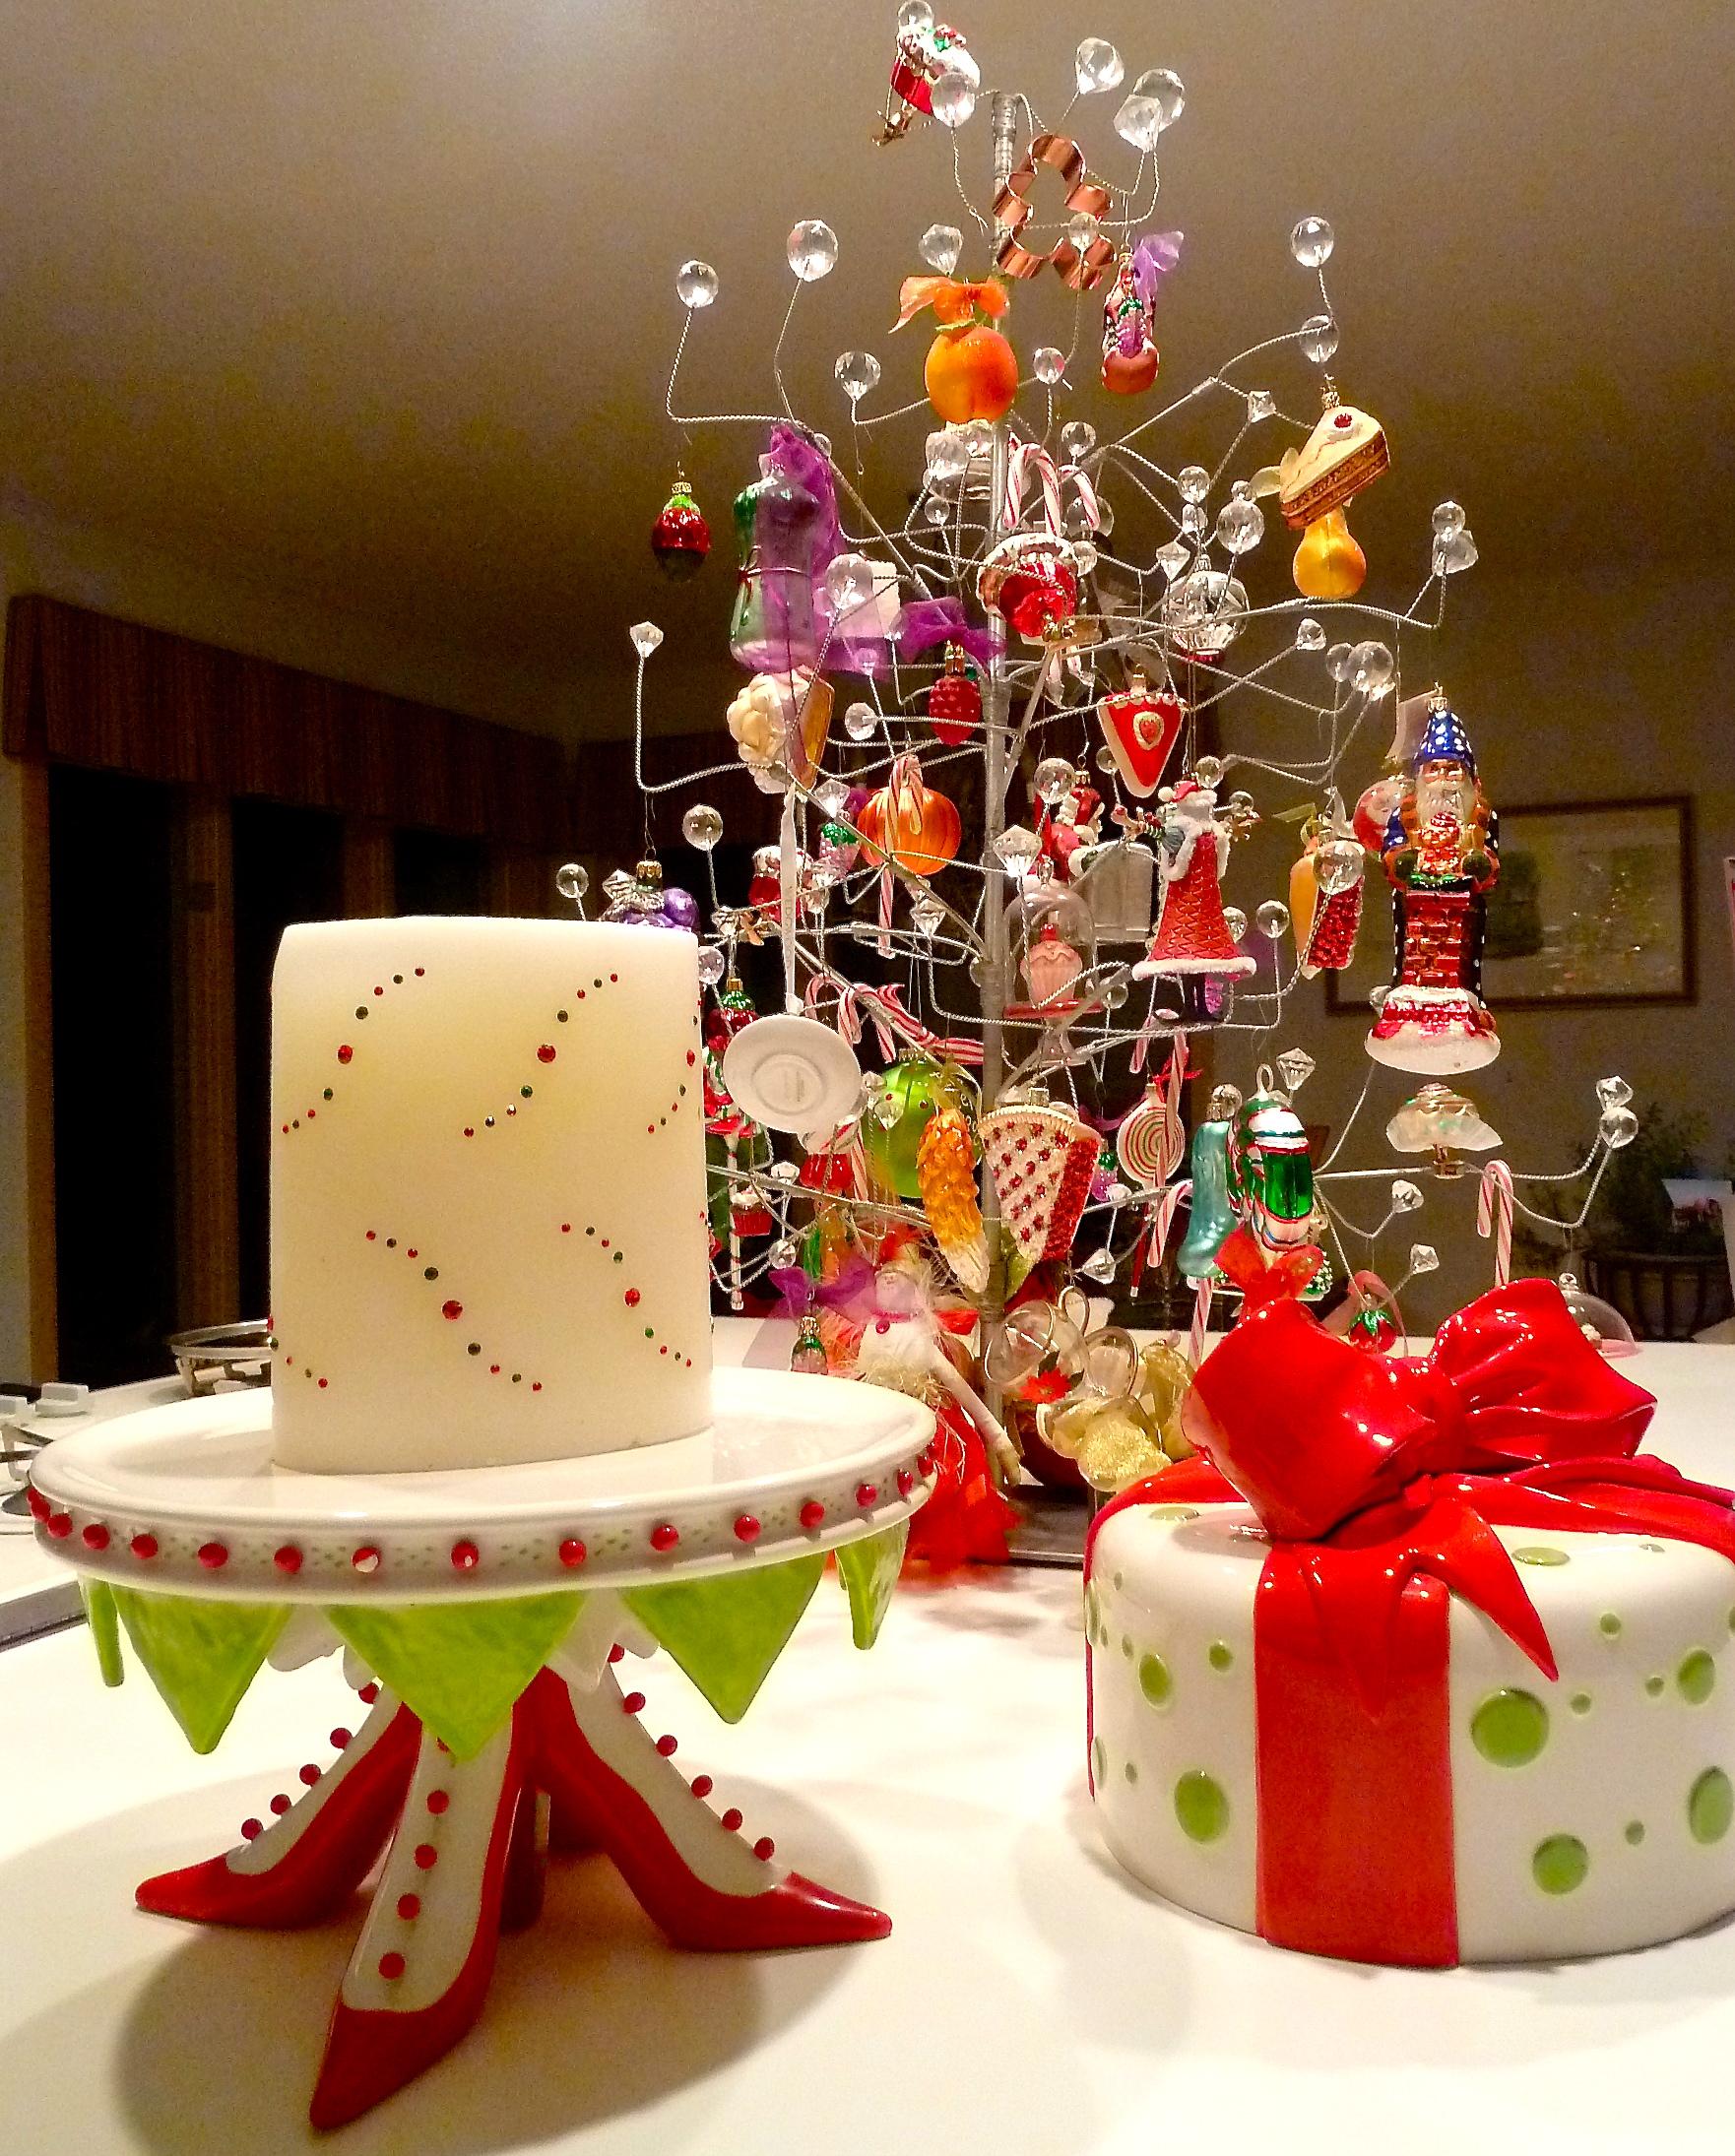 TST_Christmastree_desserts_Santas_photo#7.jpeg